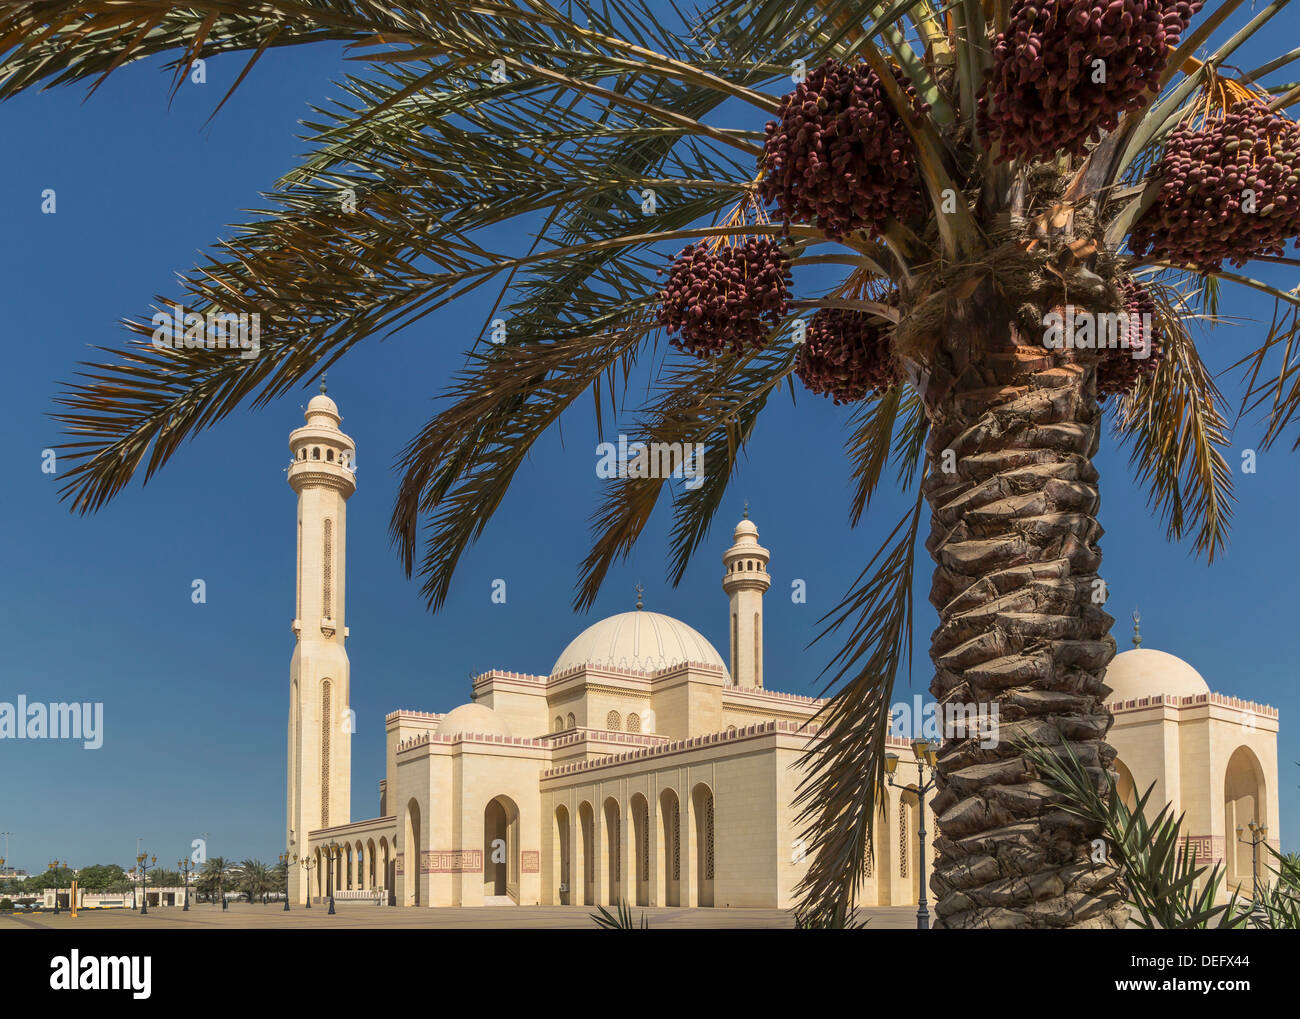 Al Fateh Grande Moschea, Manama, Bahrein, Medio Oriente Immagini Stock